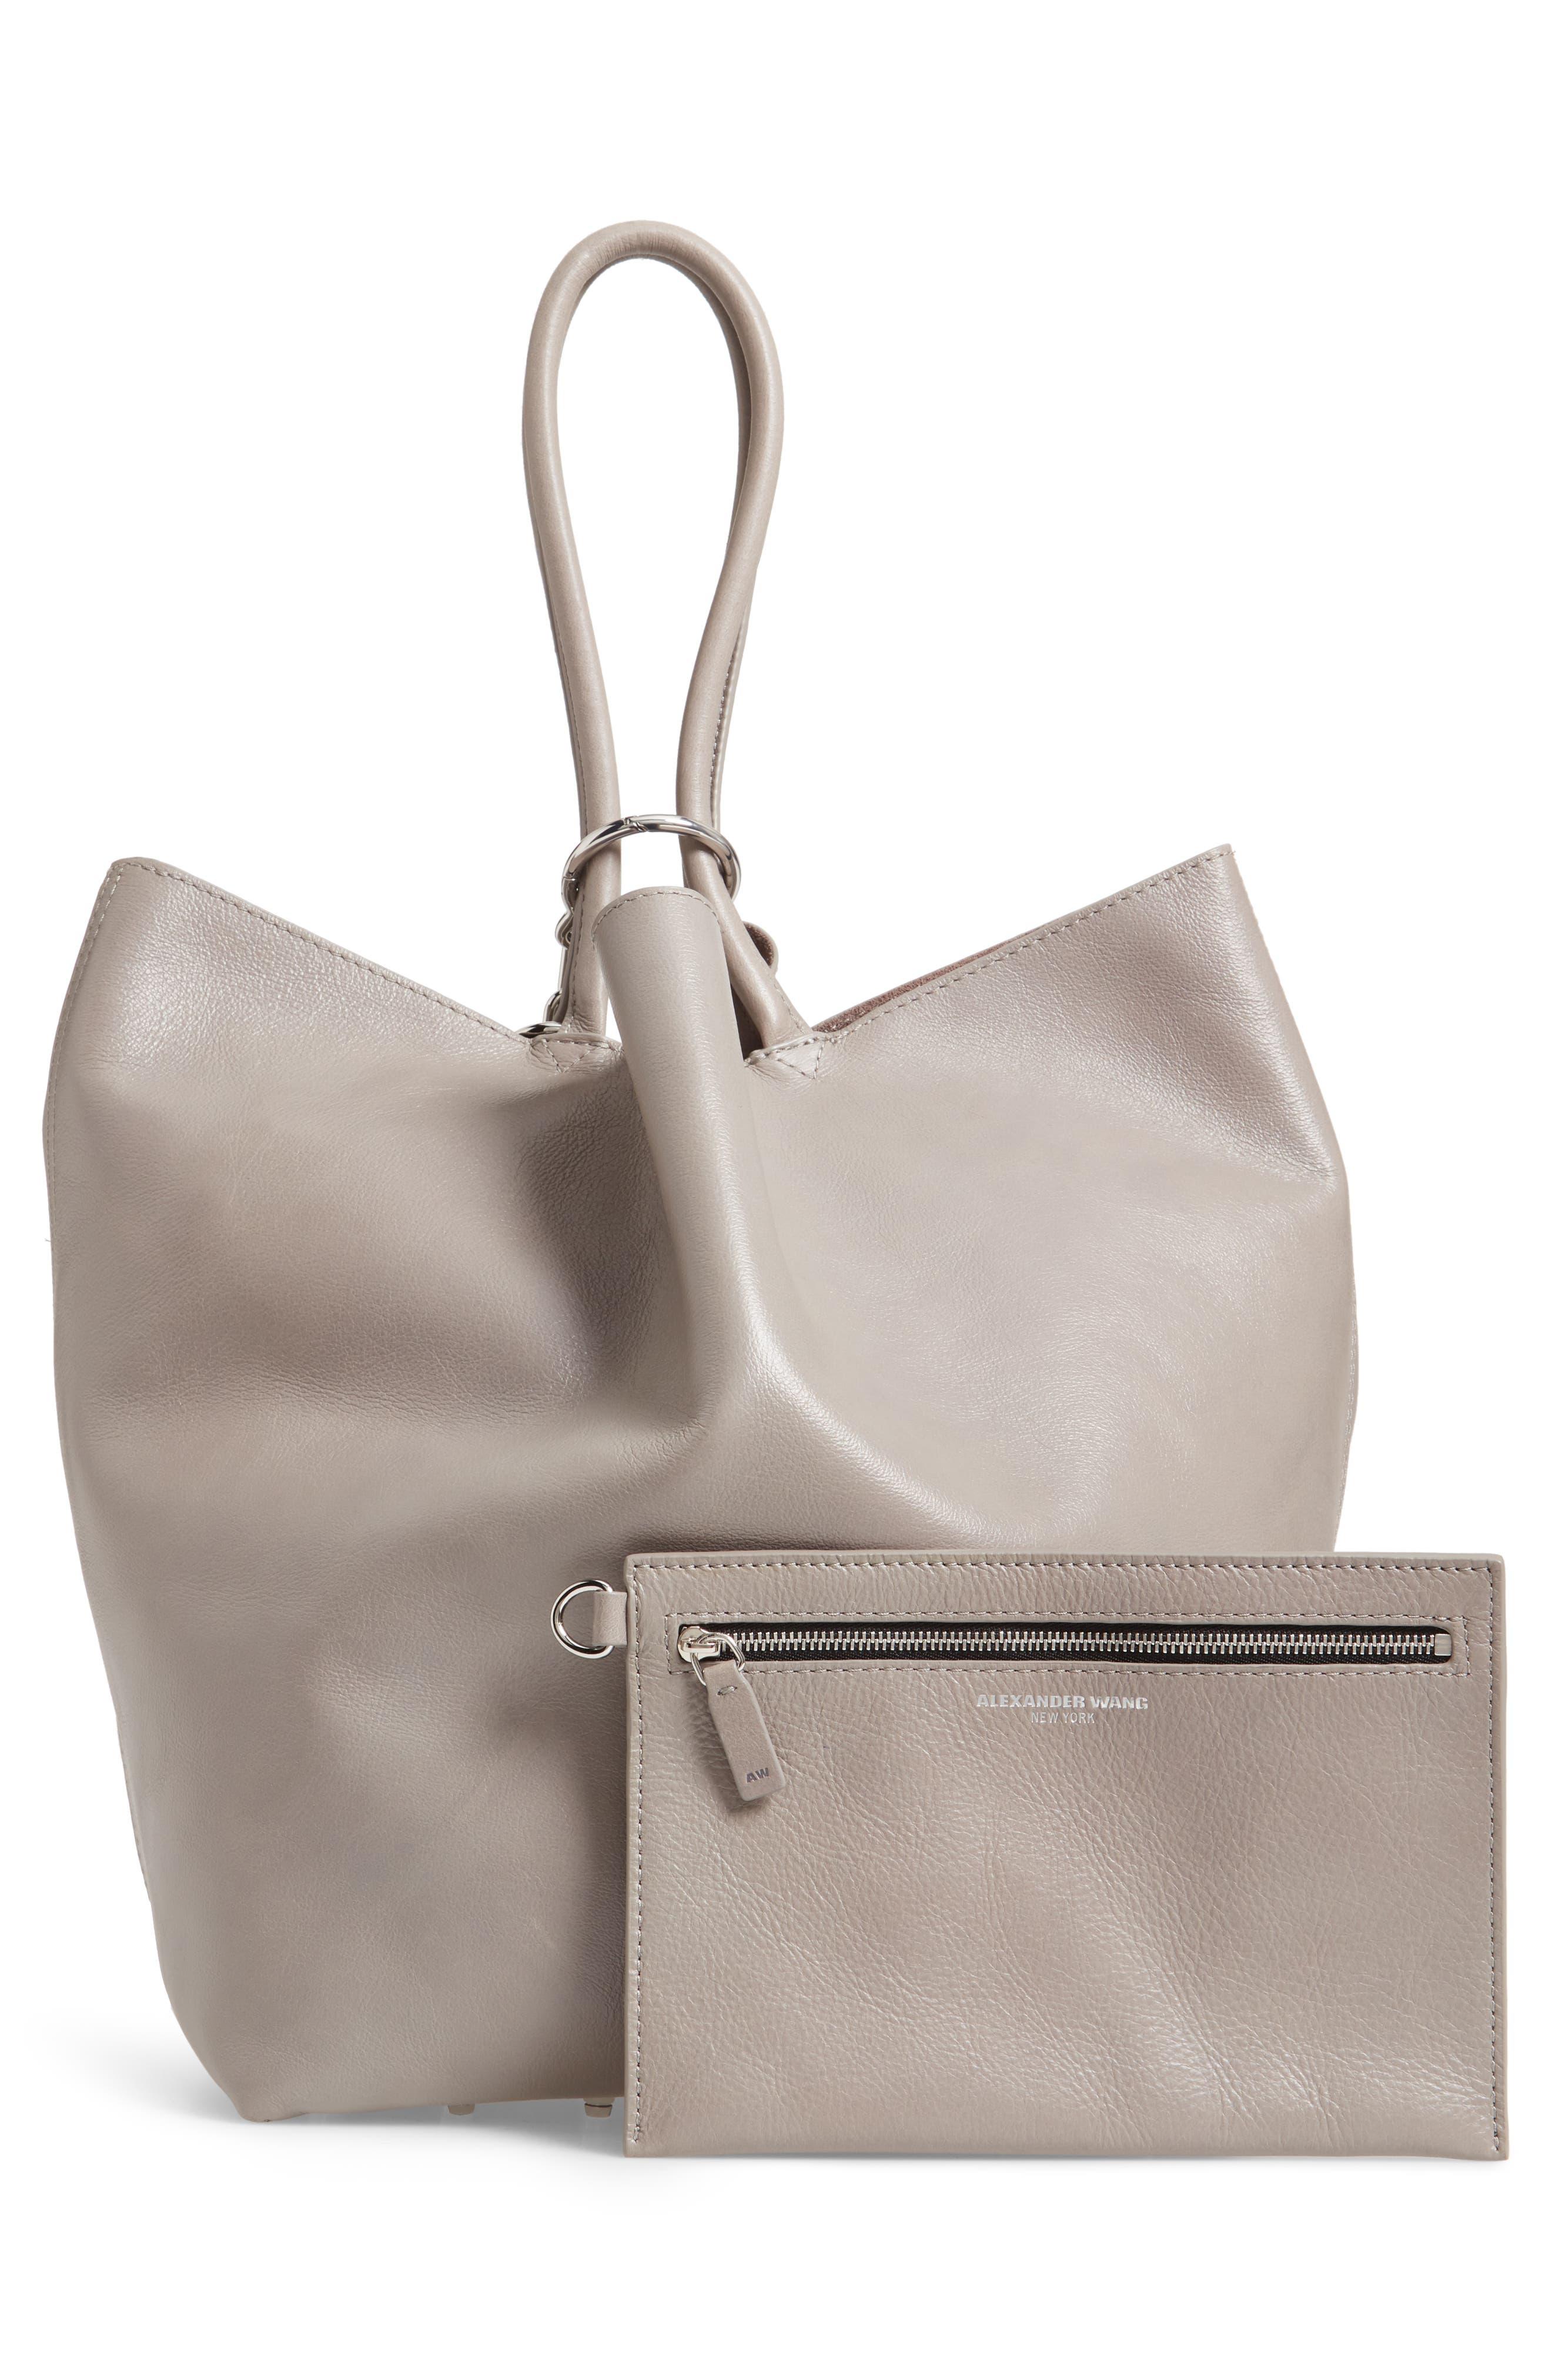 Roxy Large Leather Tote Bag,                             Alternate thumbnail 3, color,                             SLATE